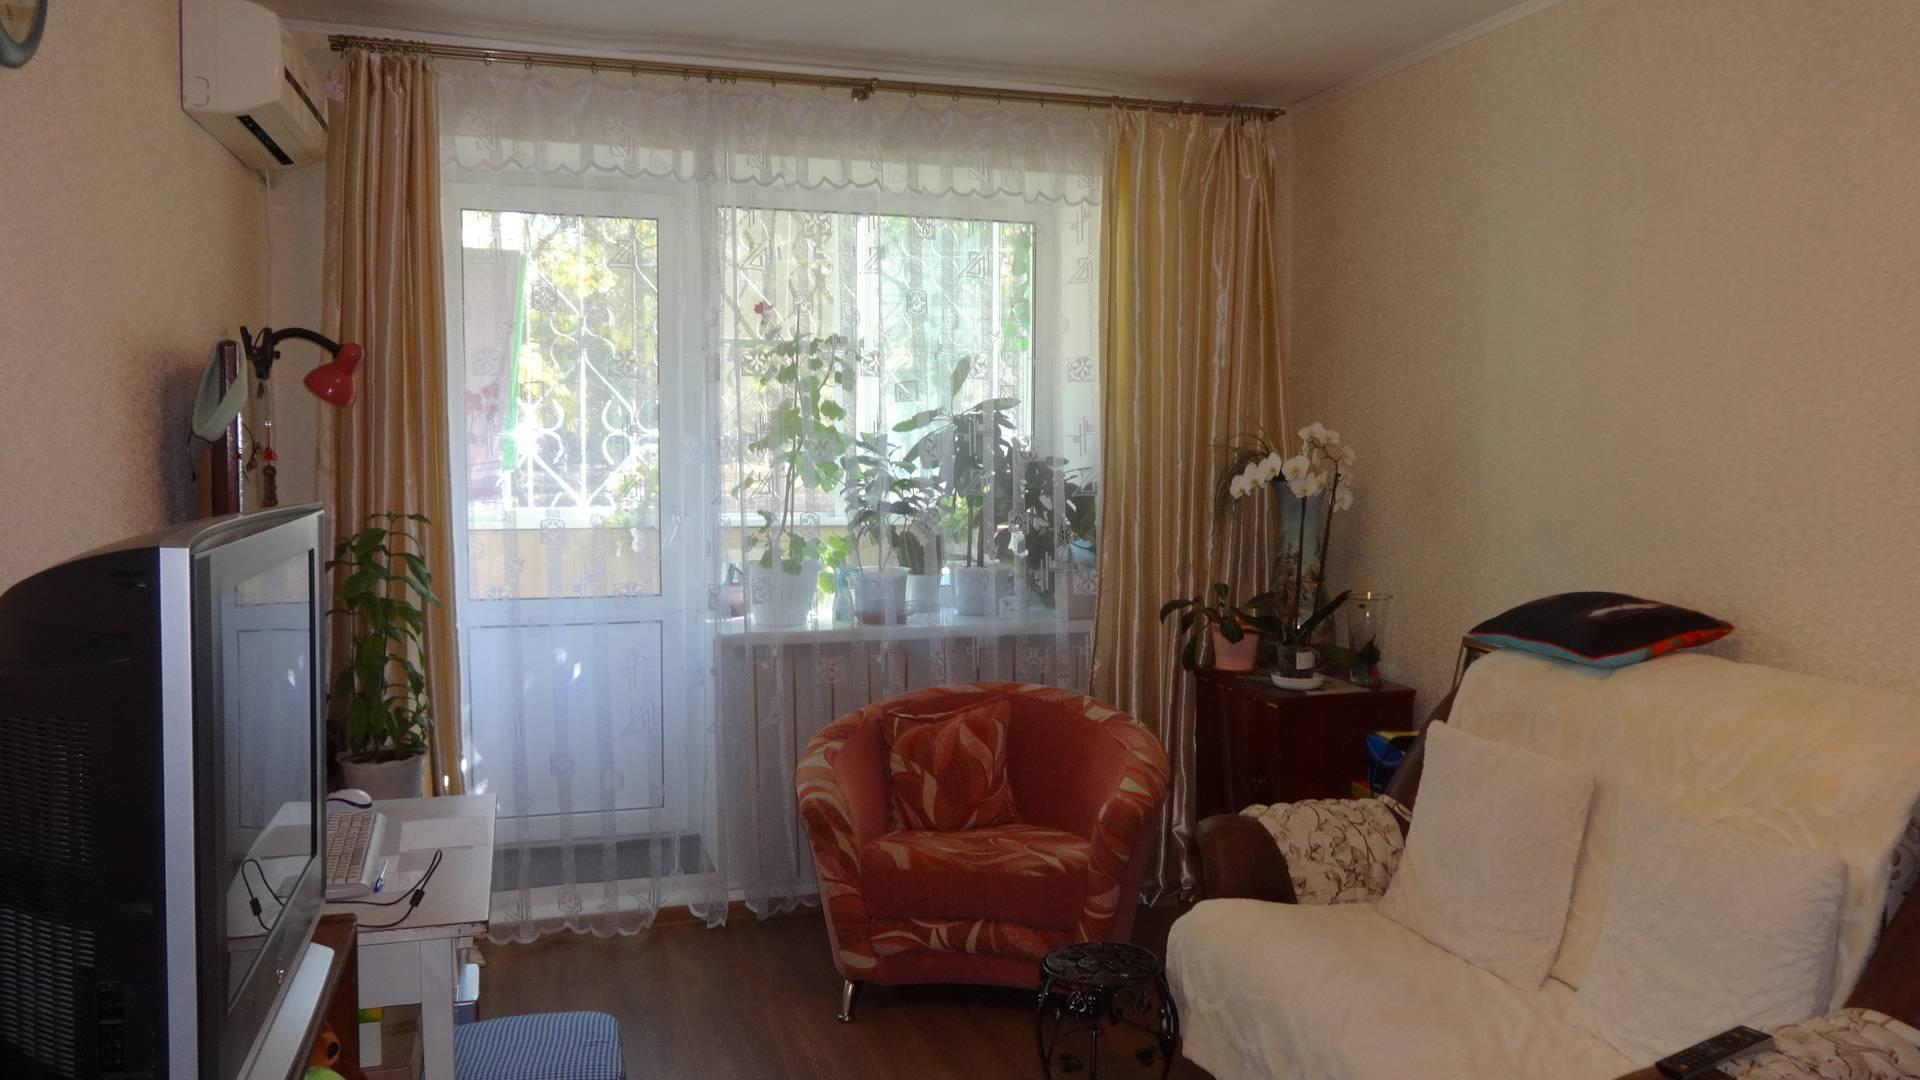 Купить 1 комн квартиру в хабаровске на авито